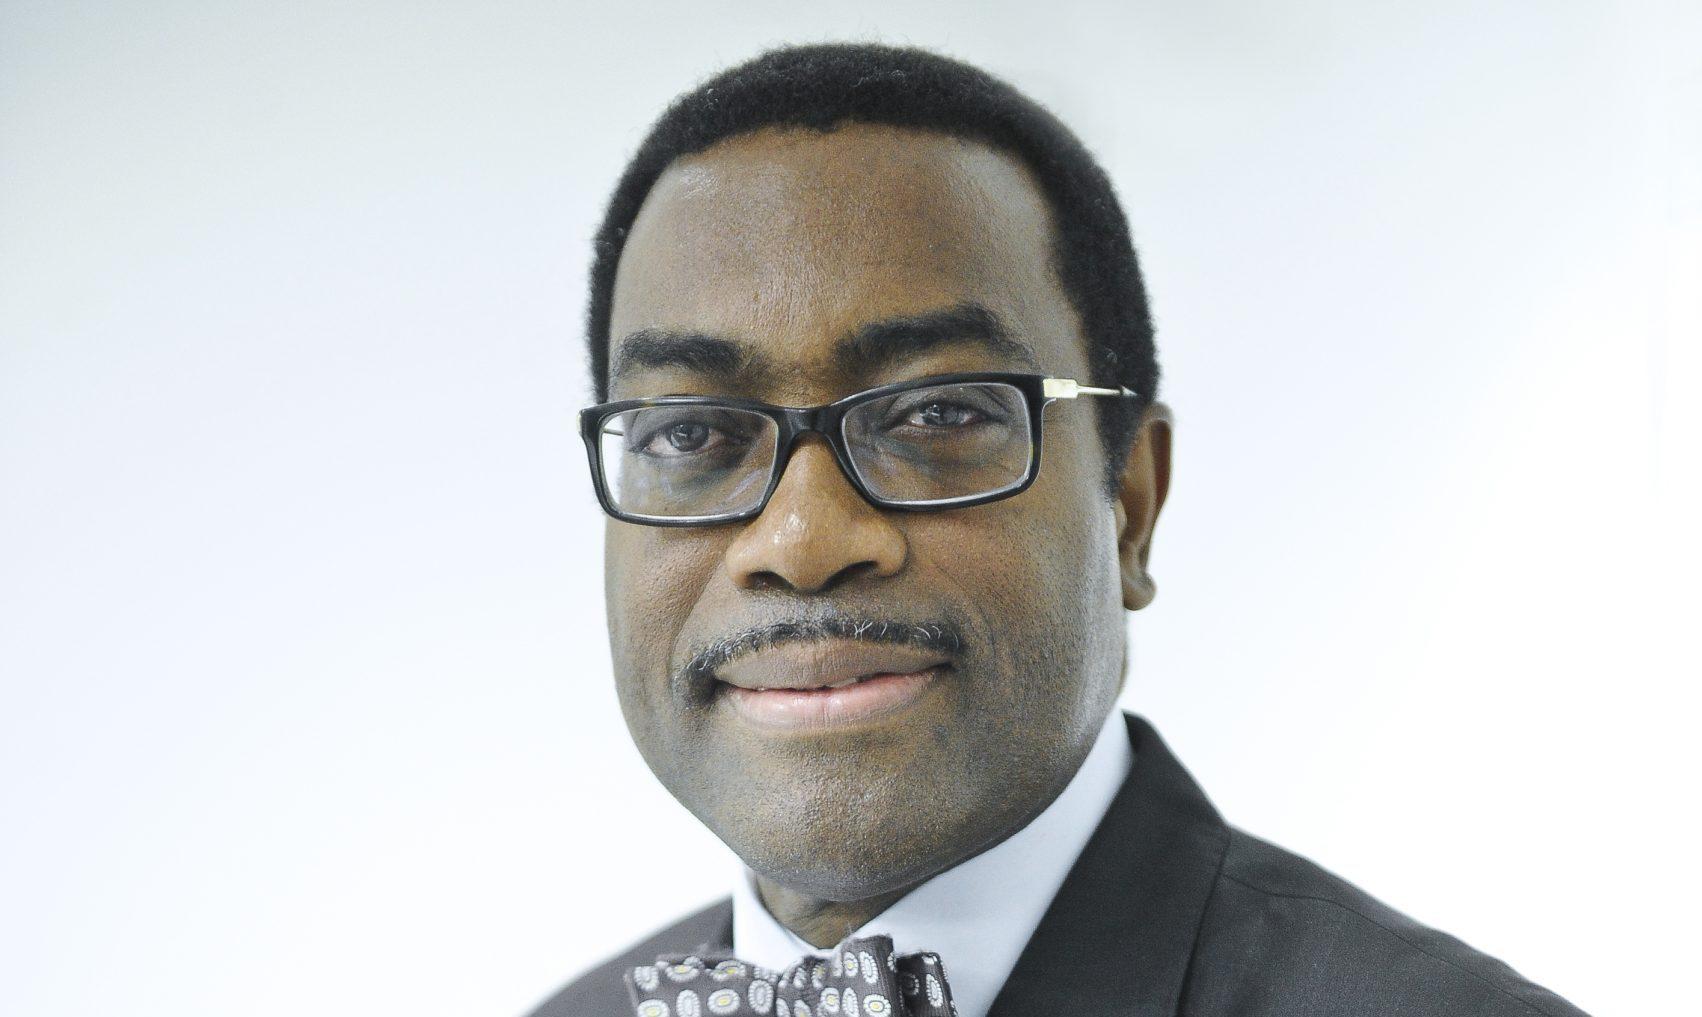 Akinwumi Ayodeji Adesina